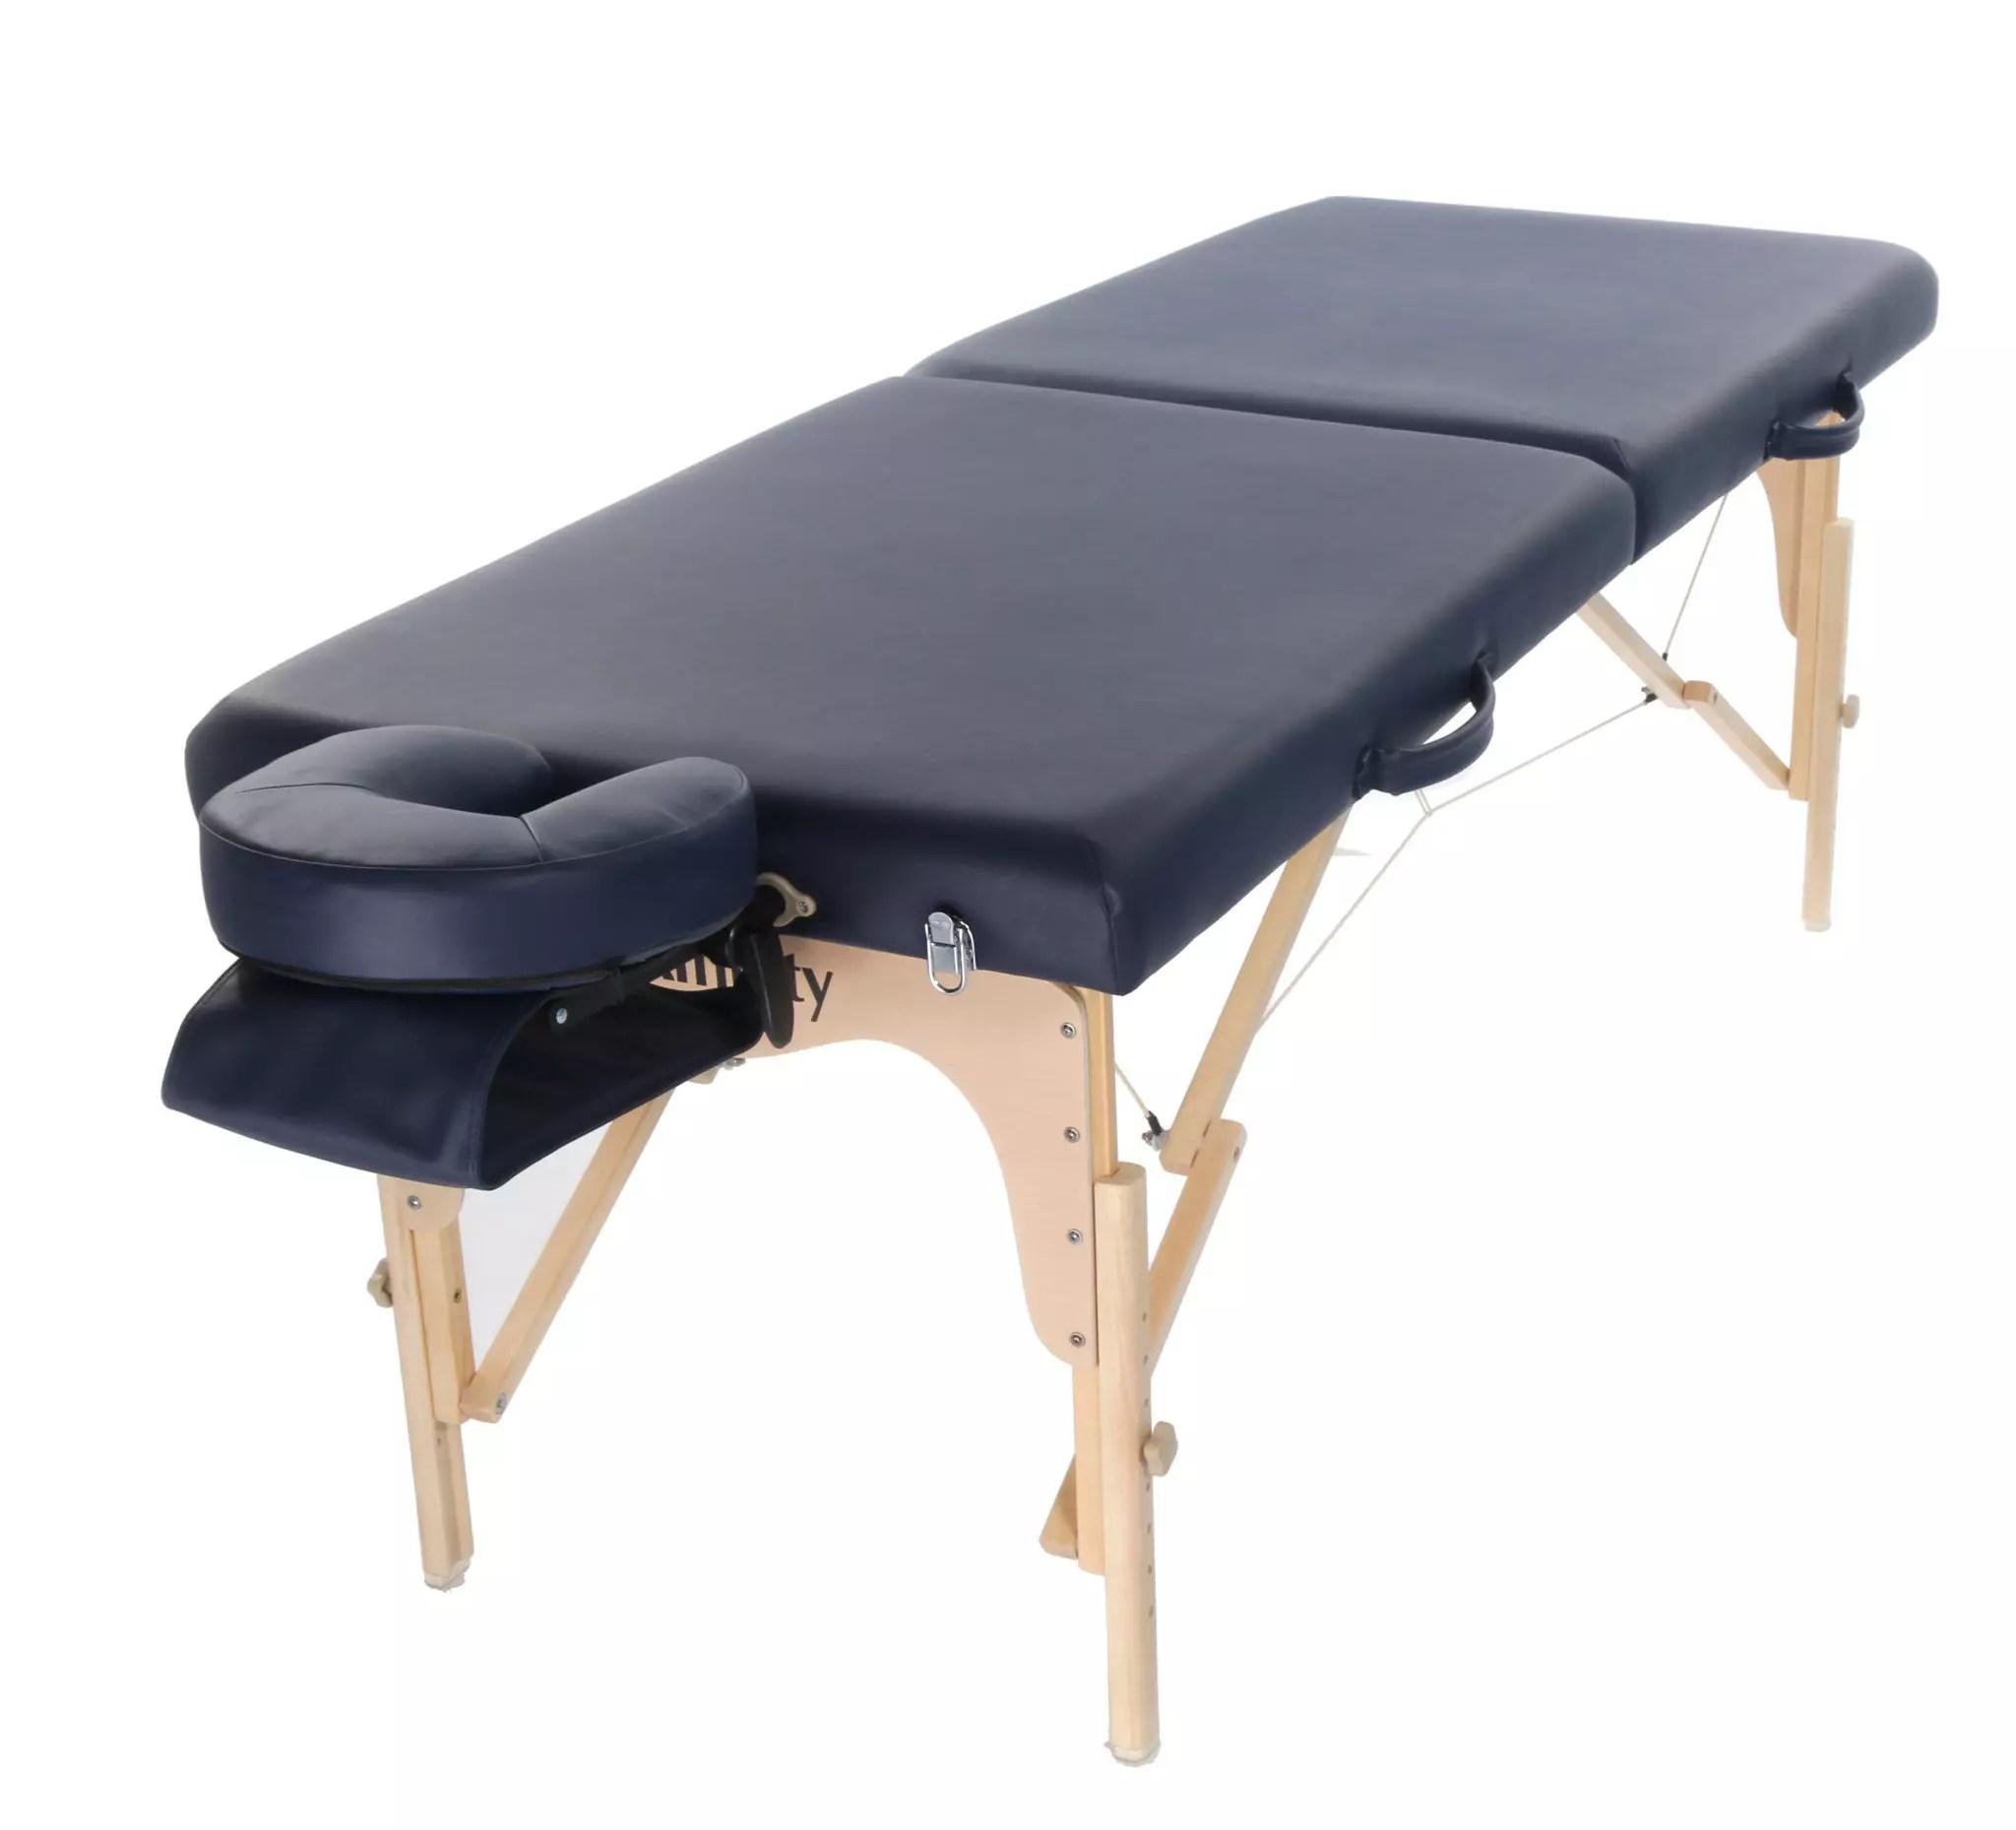 Affinity Sienna Portable Massage Tabel - Body Massage Shop-8919